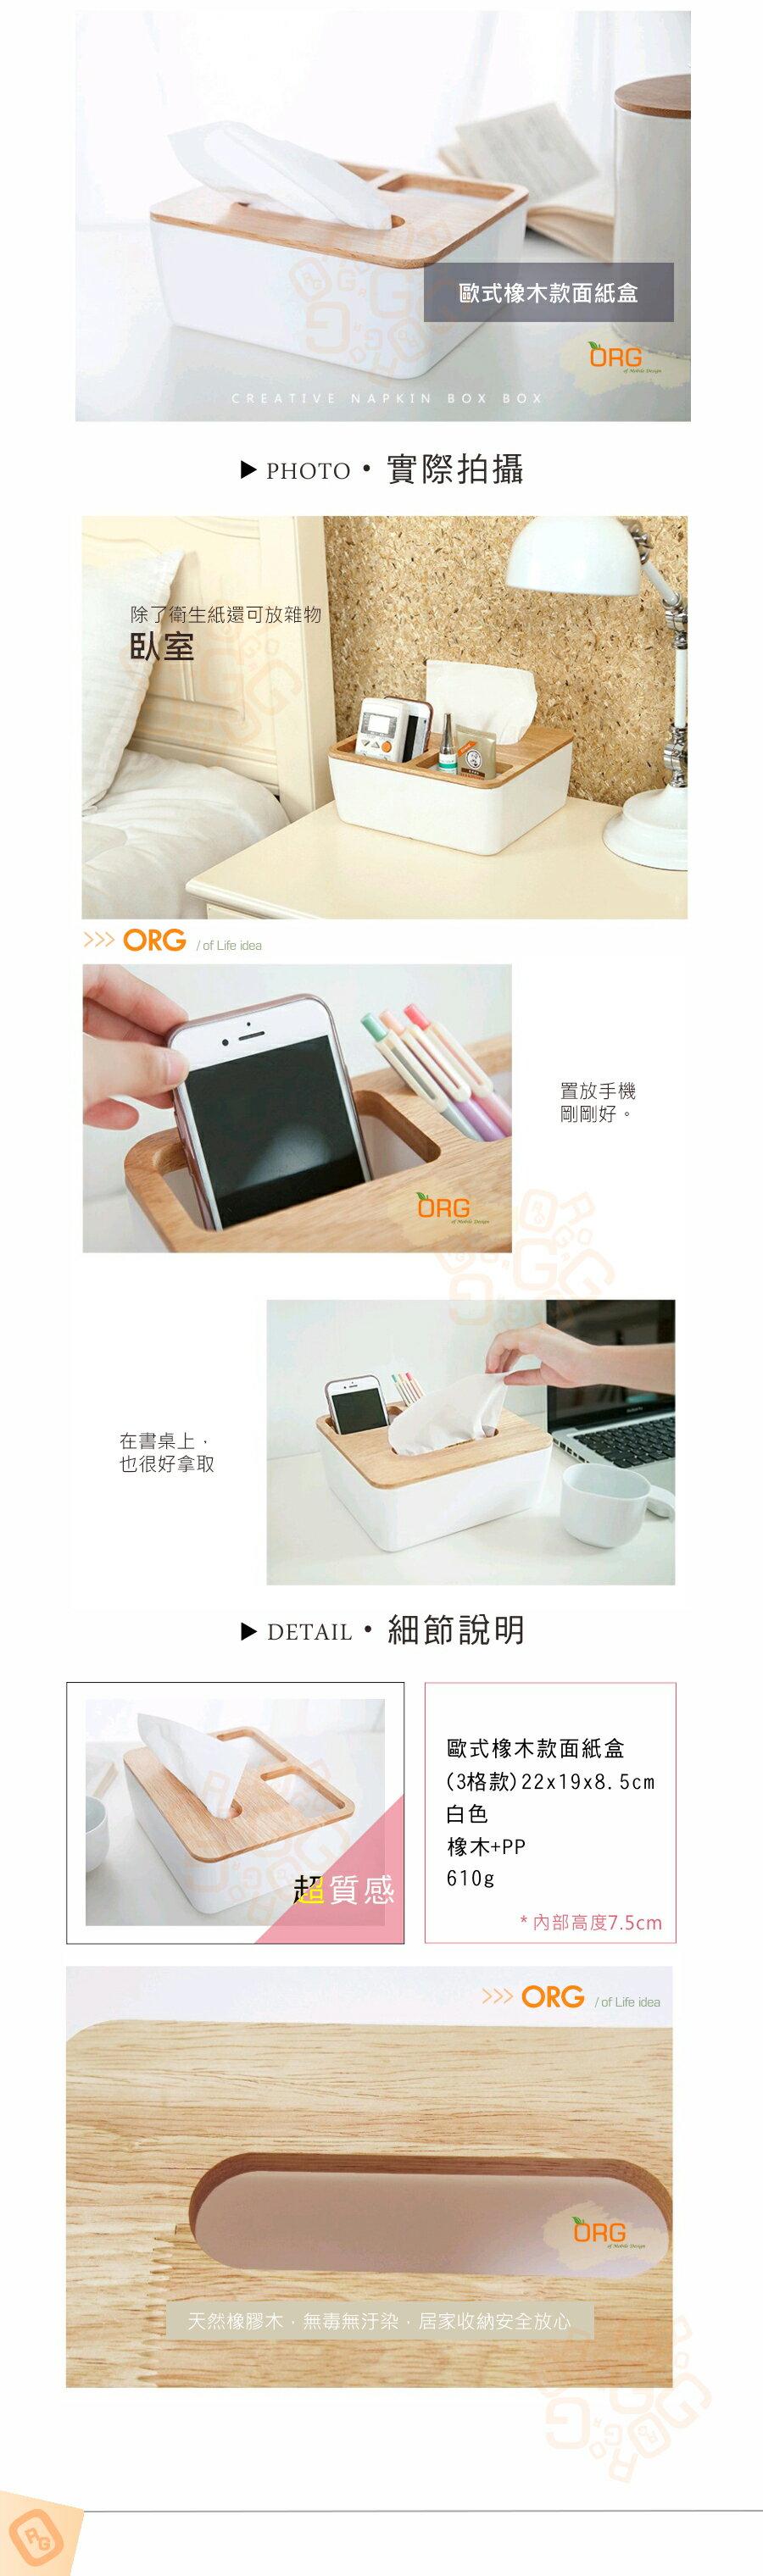 ORG《SD0751》猶如歐式~3格設計 面紙盒 衛生紙盒 面紙 桌面 桌上 收納 置物盒 禮物 佈置 大掃除 生活用品 1